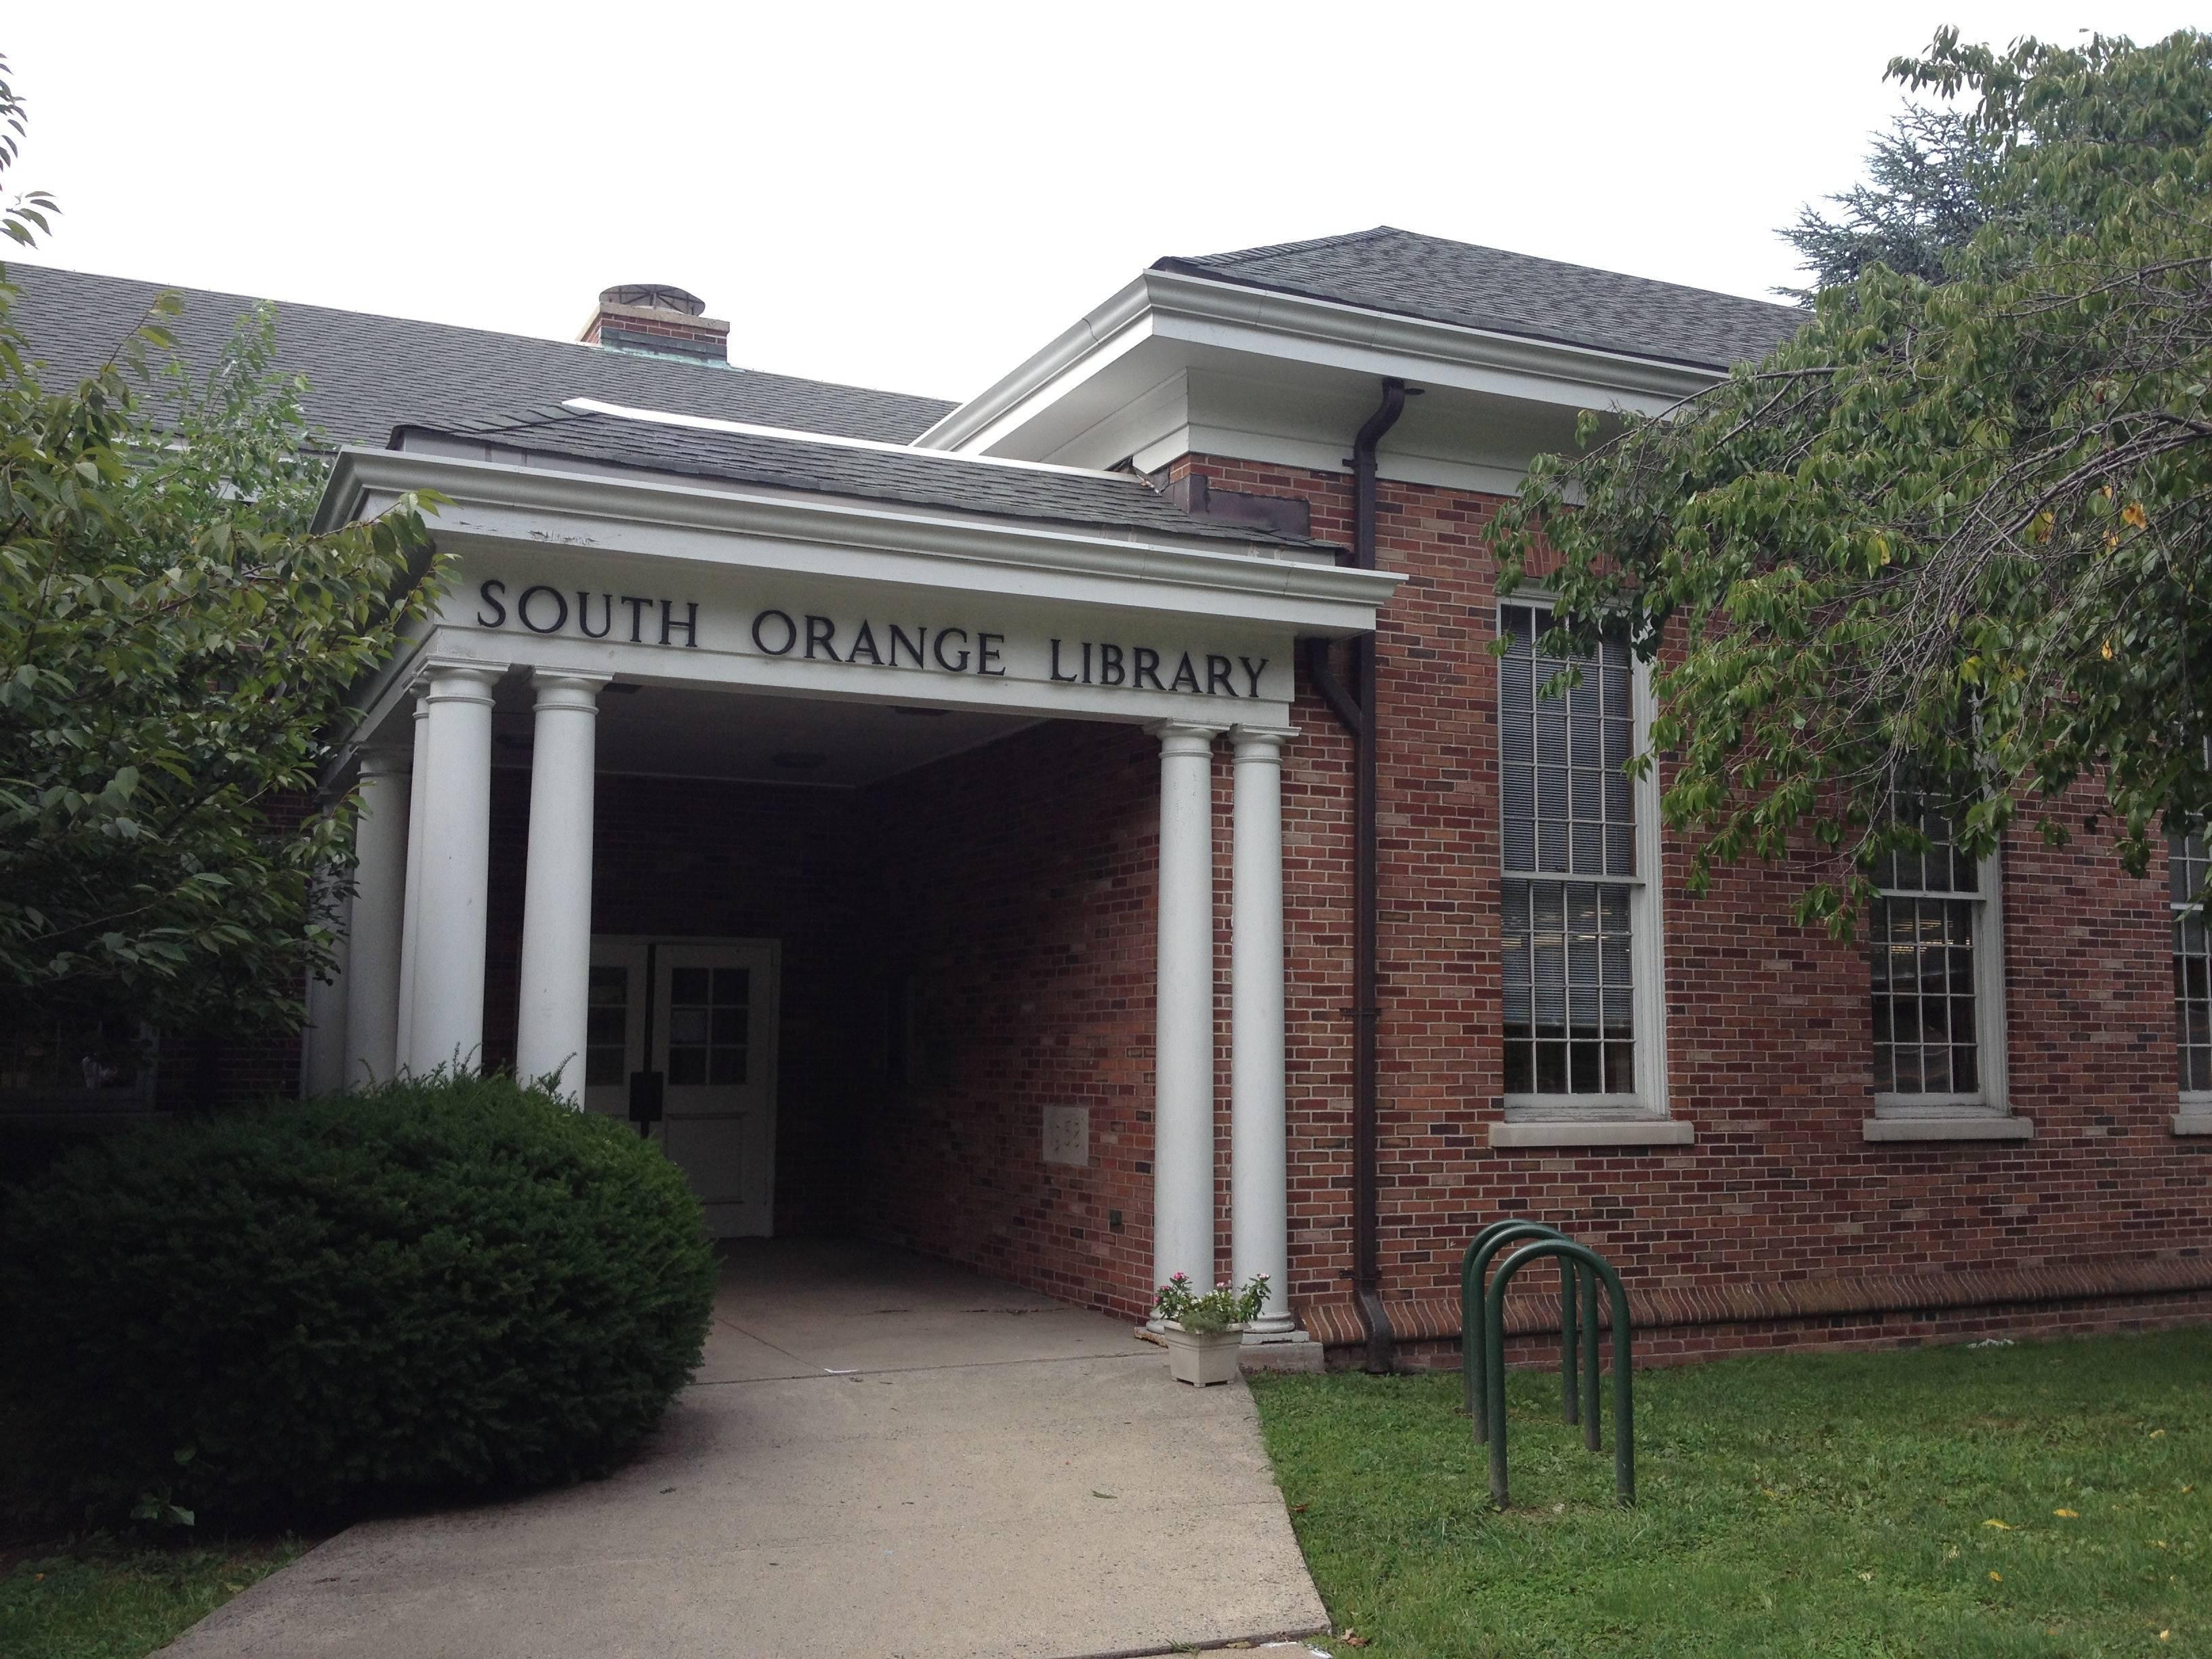 d302d3caff2300b9cf1f_South_Orange_Library.JPG